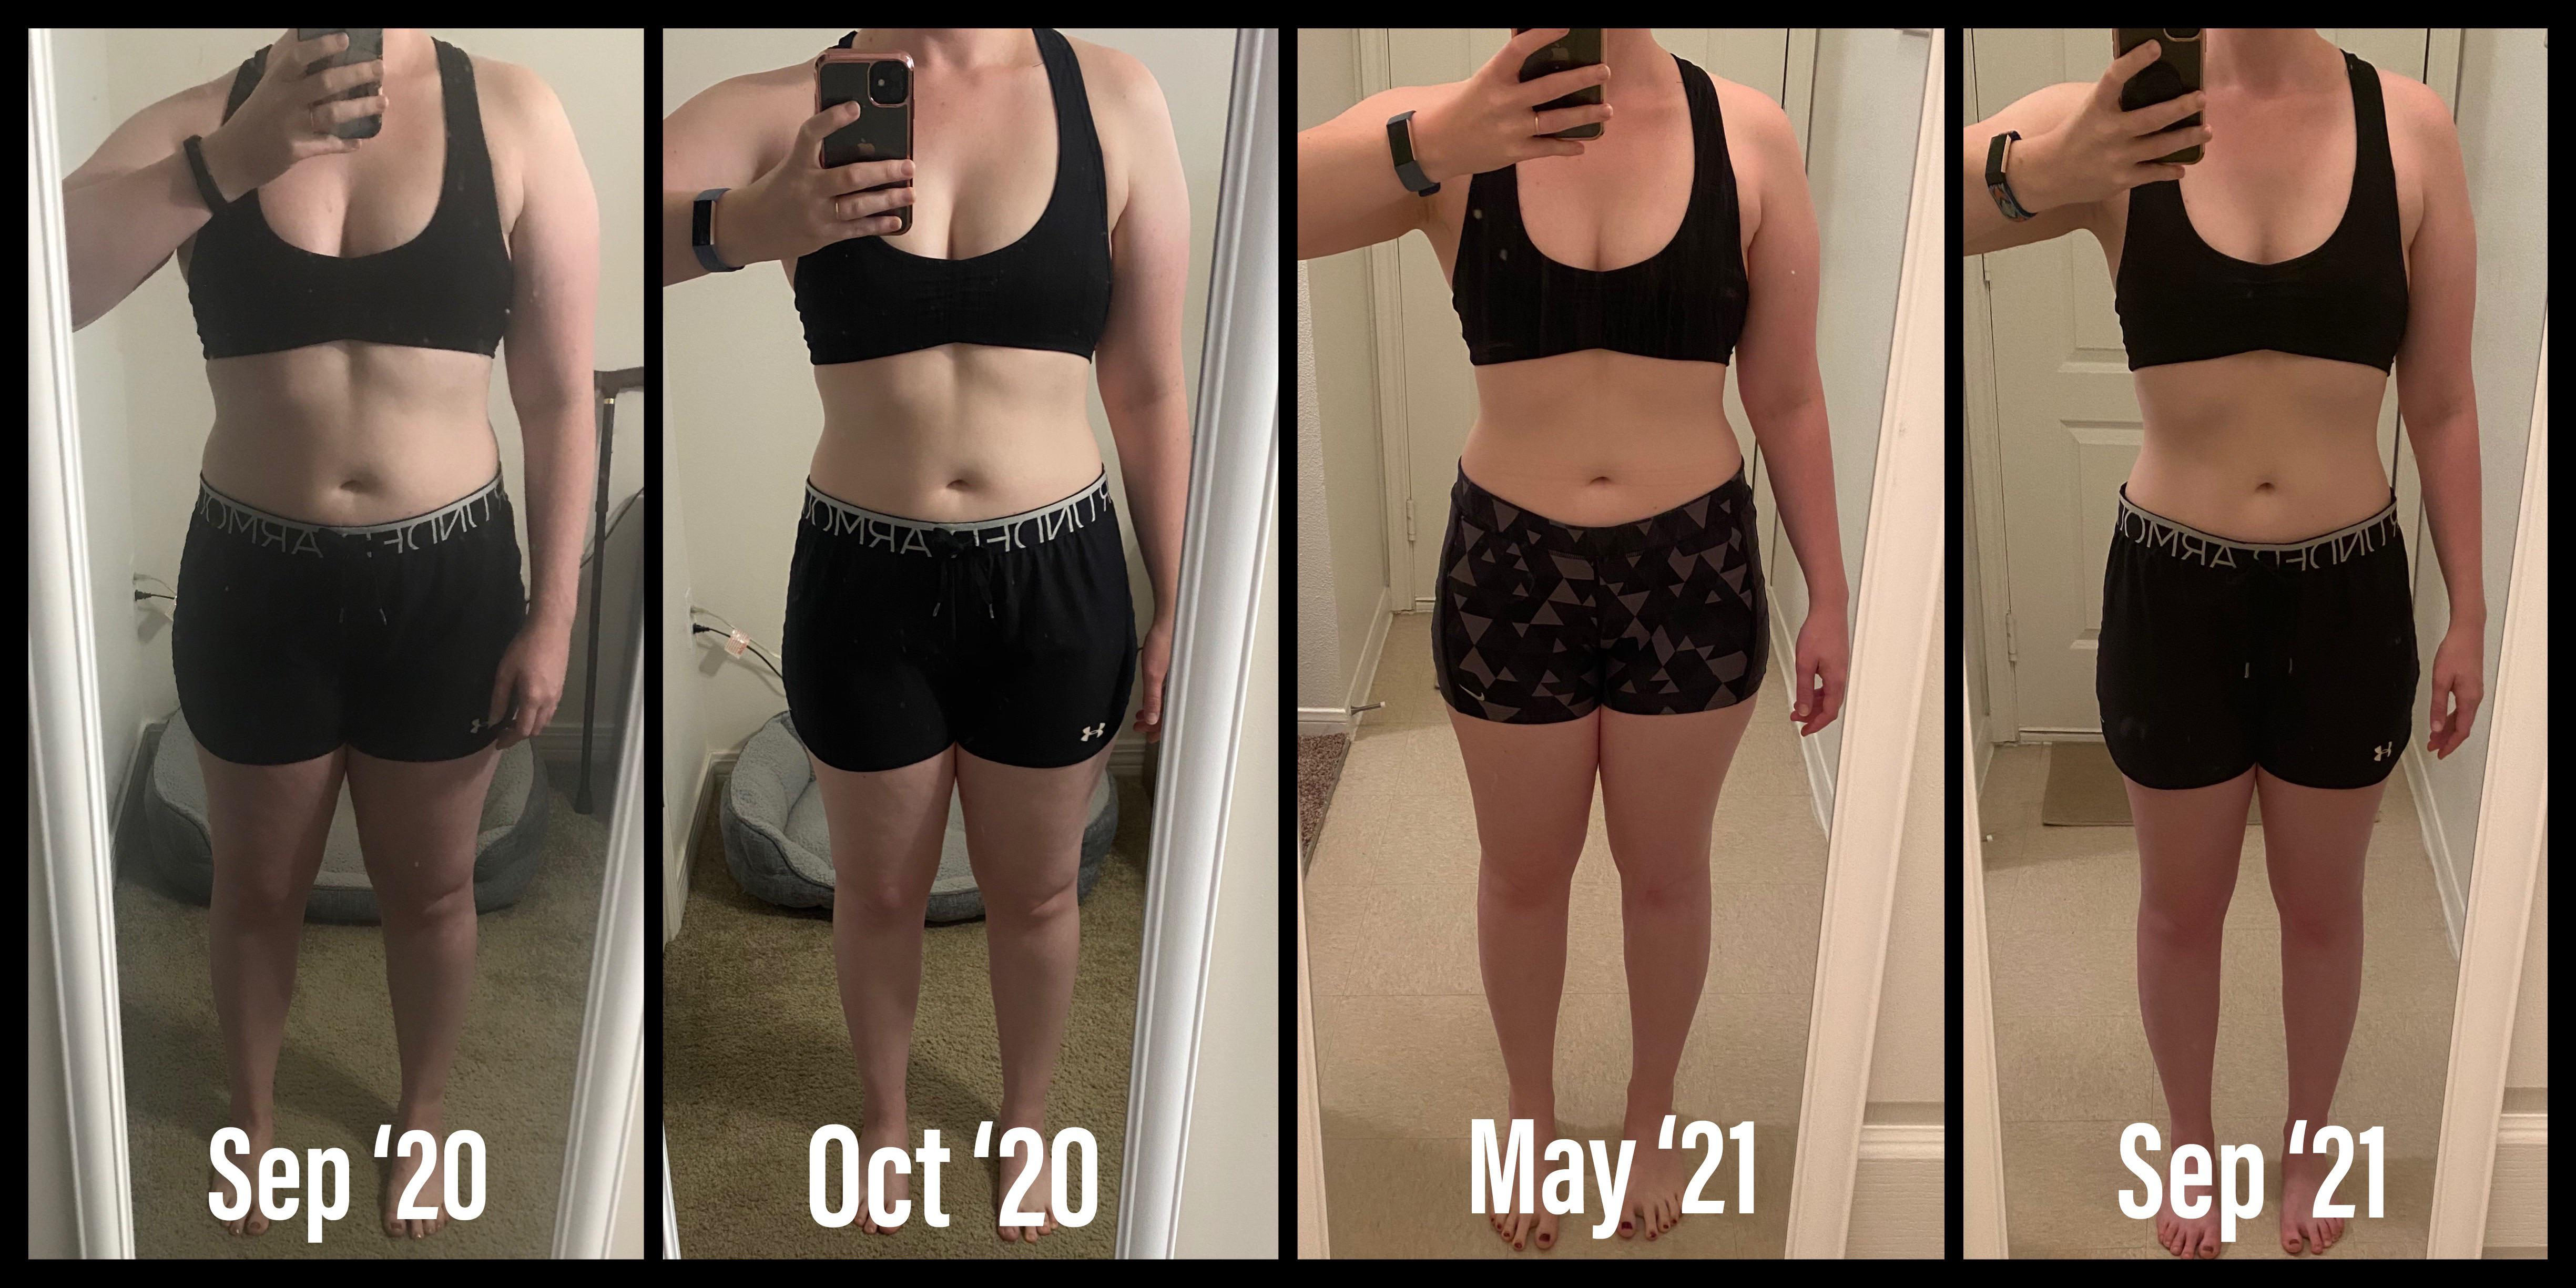 30 lbs Fat Loss 5'6 Female 185 lbs to 155 lbs